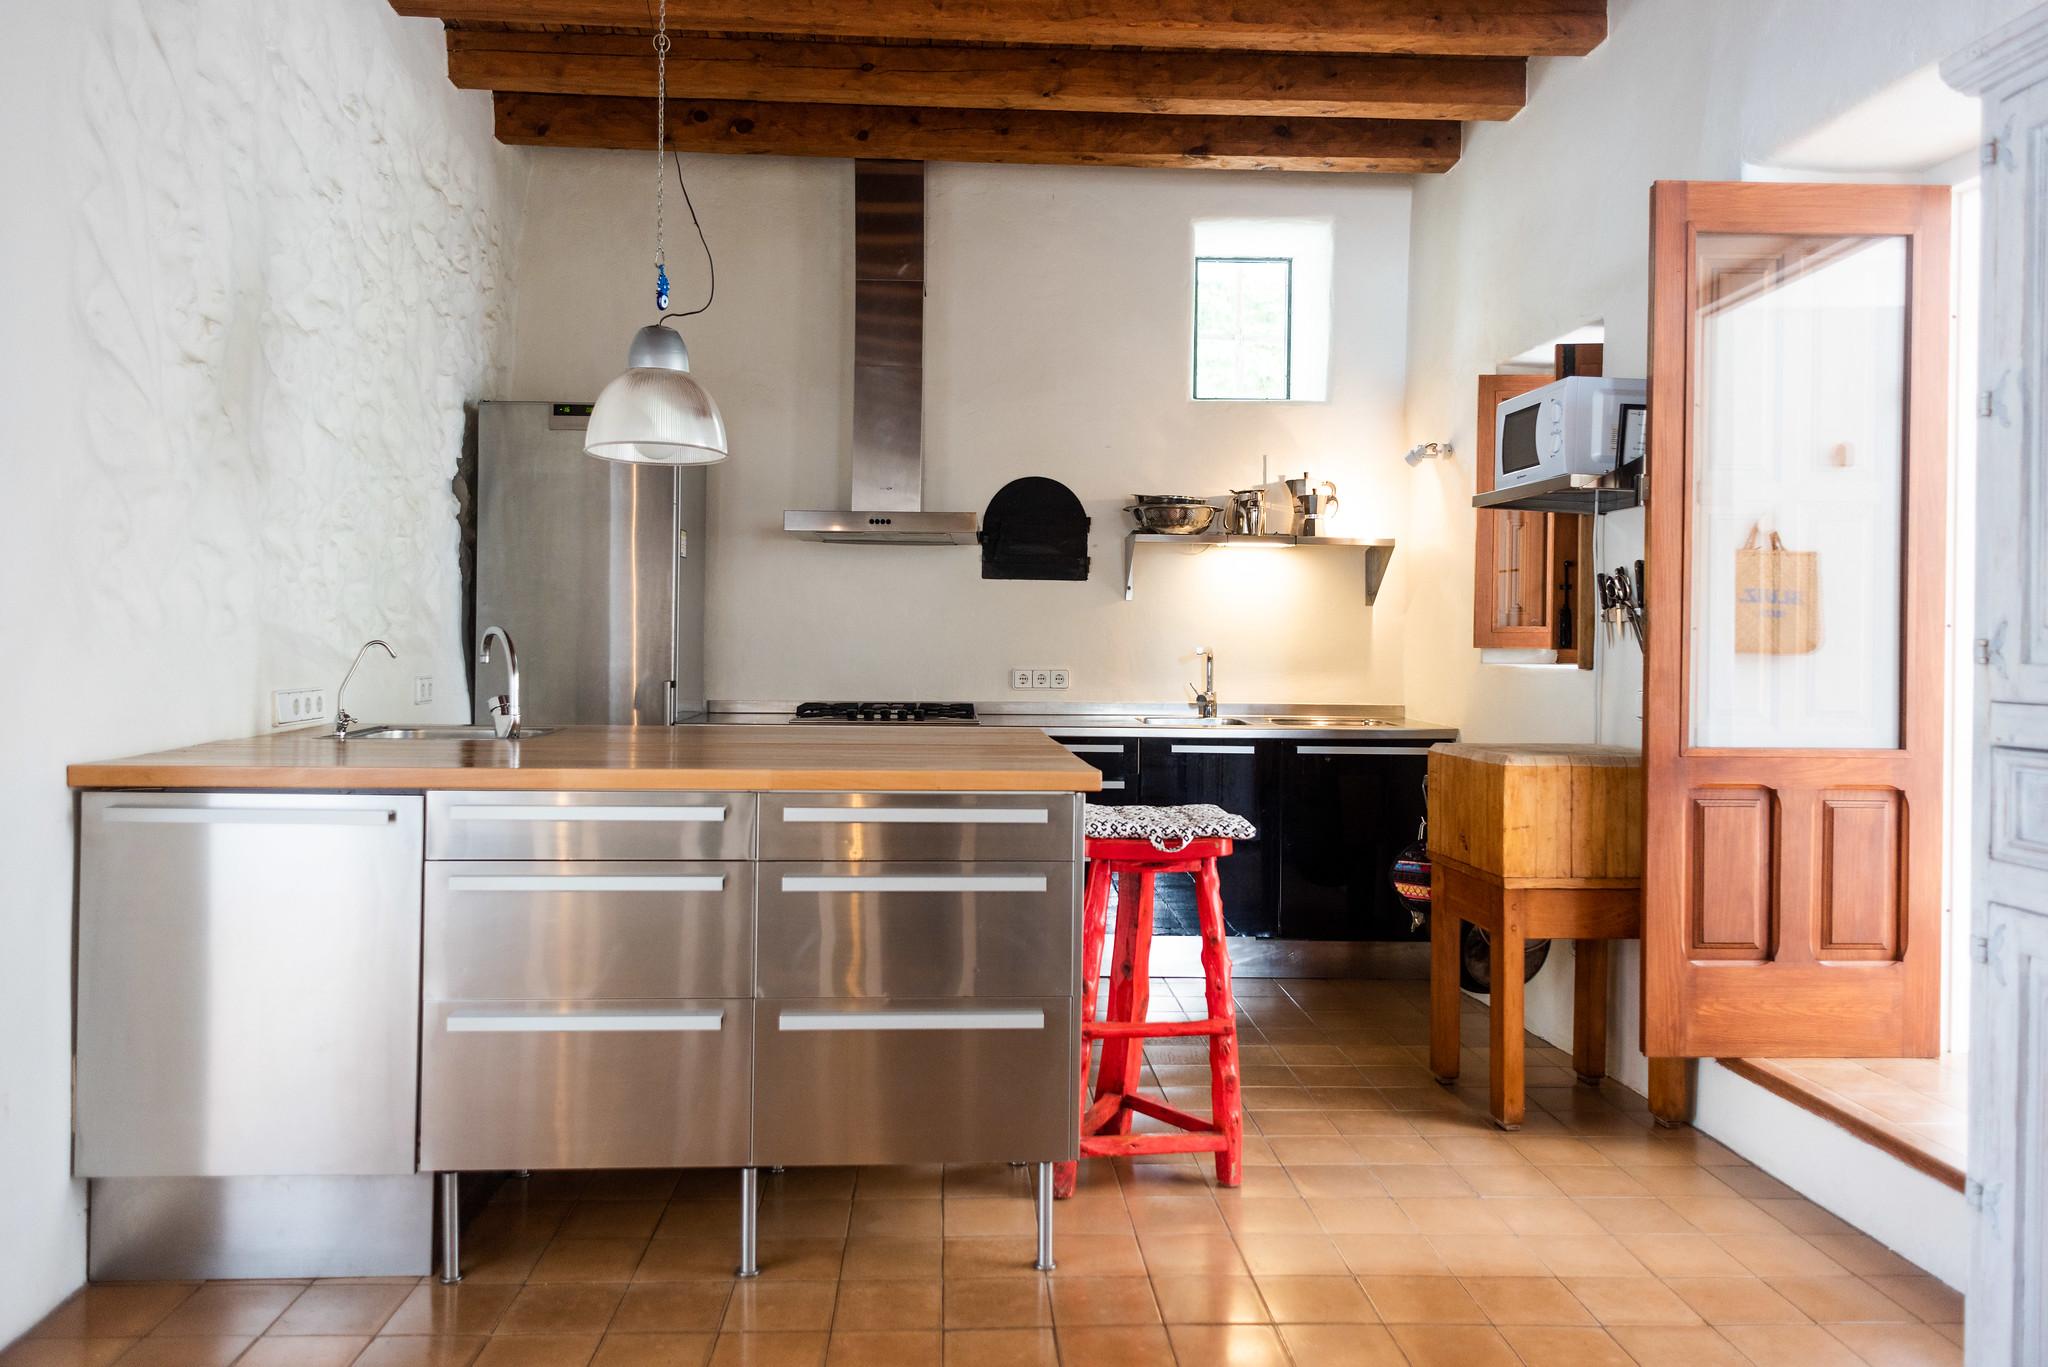 https://www.white-ibiza.com/wp-content/uploads/2020/05/white-ibiza-villas-can-lyra-interior-kitchen.jpg